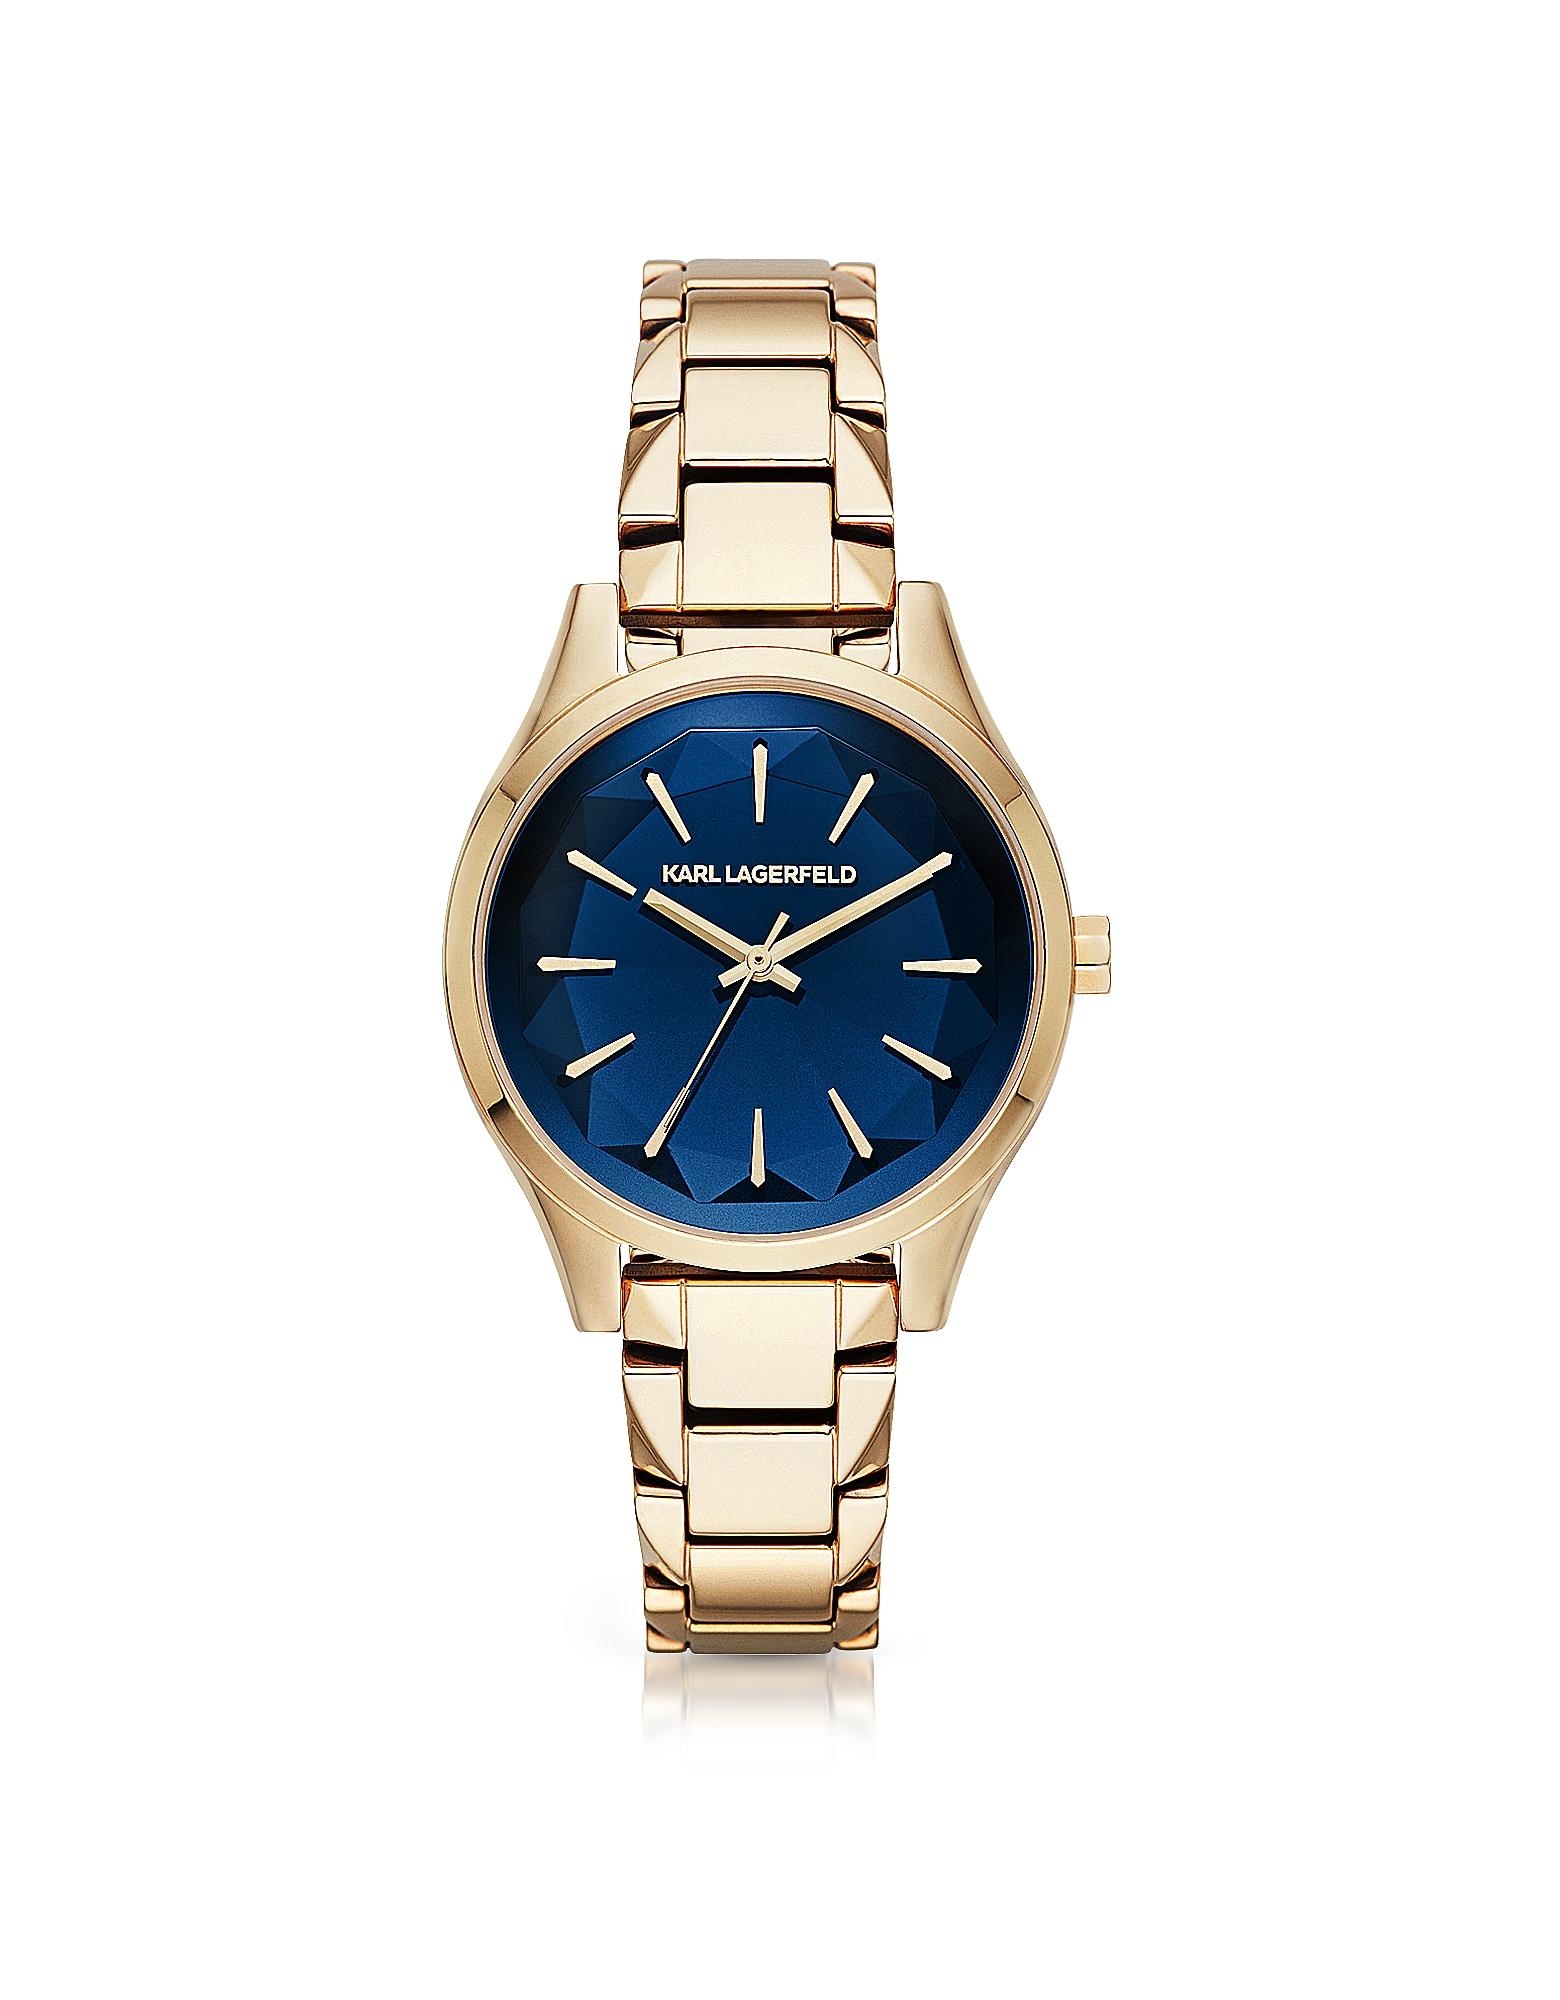 Karl Lagerfeld Women's Watches, Janelle Gold-tone PVD Stainless Steel Women's Quartz Watch w/Deep Bl